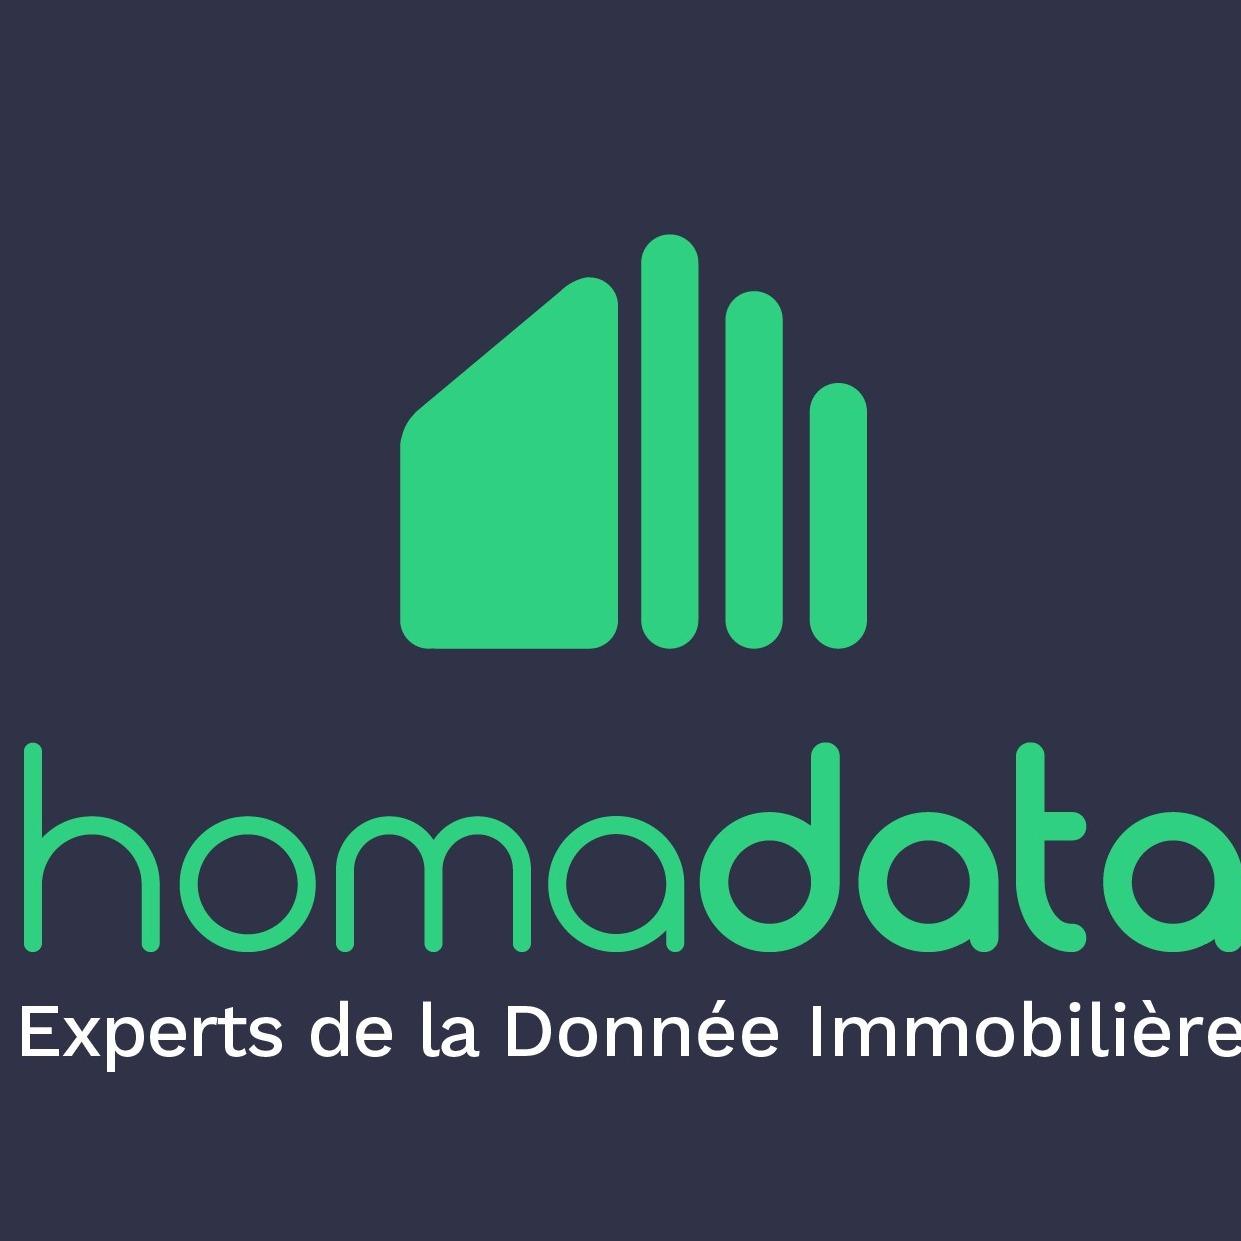 Bon de Visite / Homadata